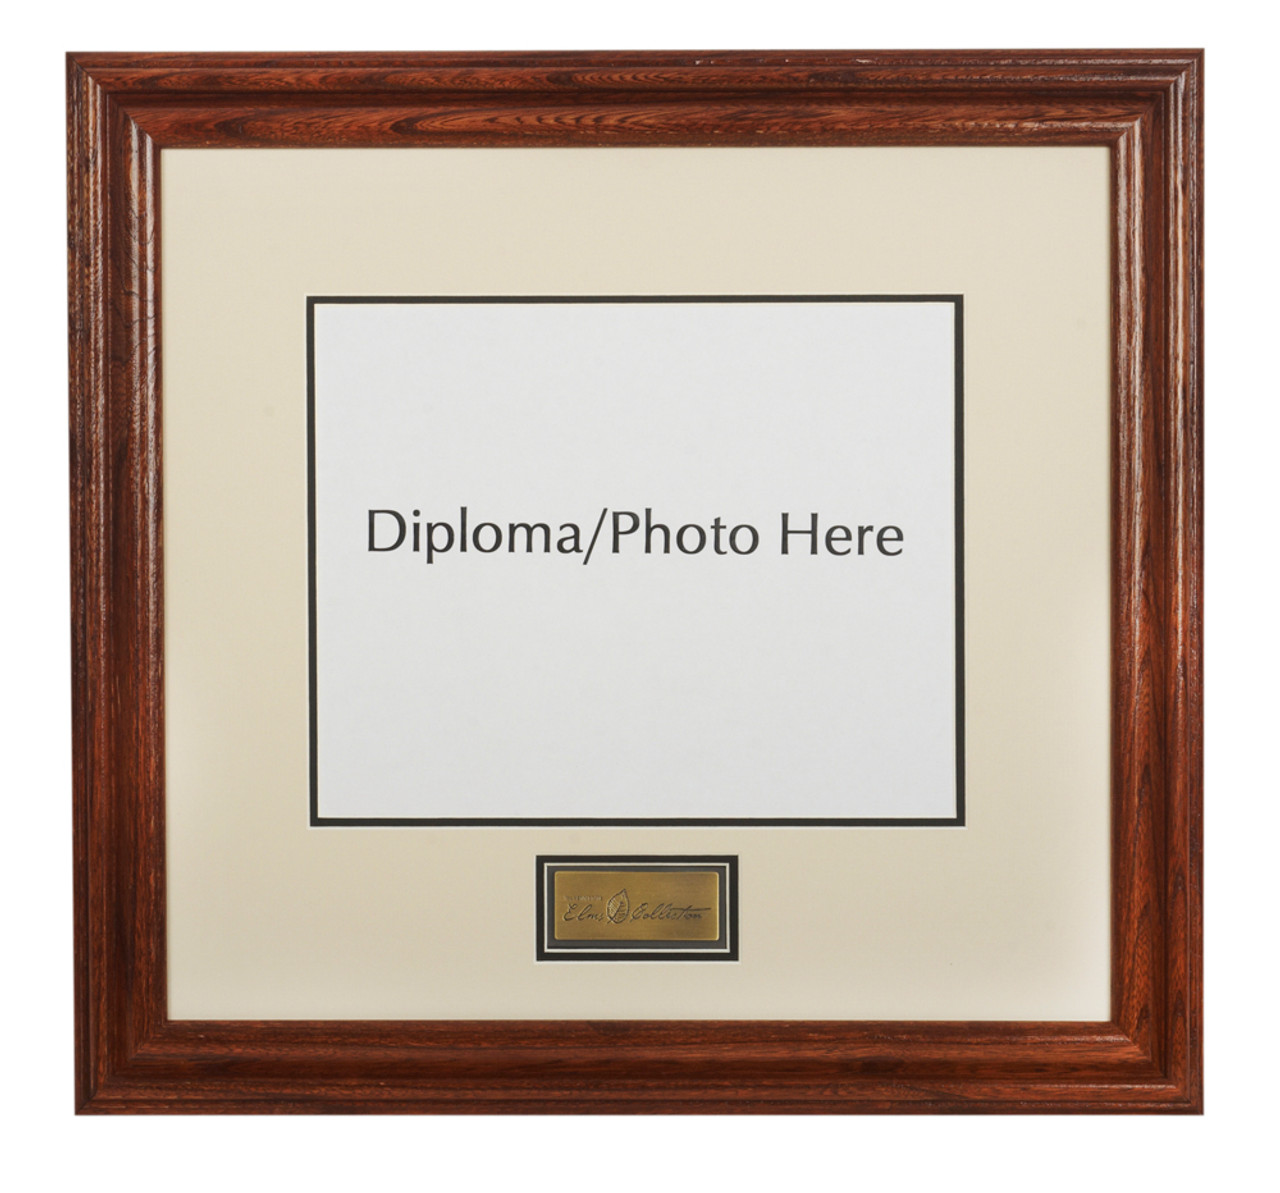 Penn State Elms Diploma Frame - The Penn State Elms Collection